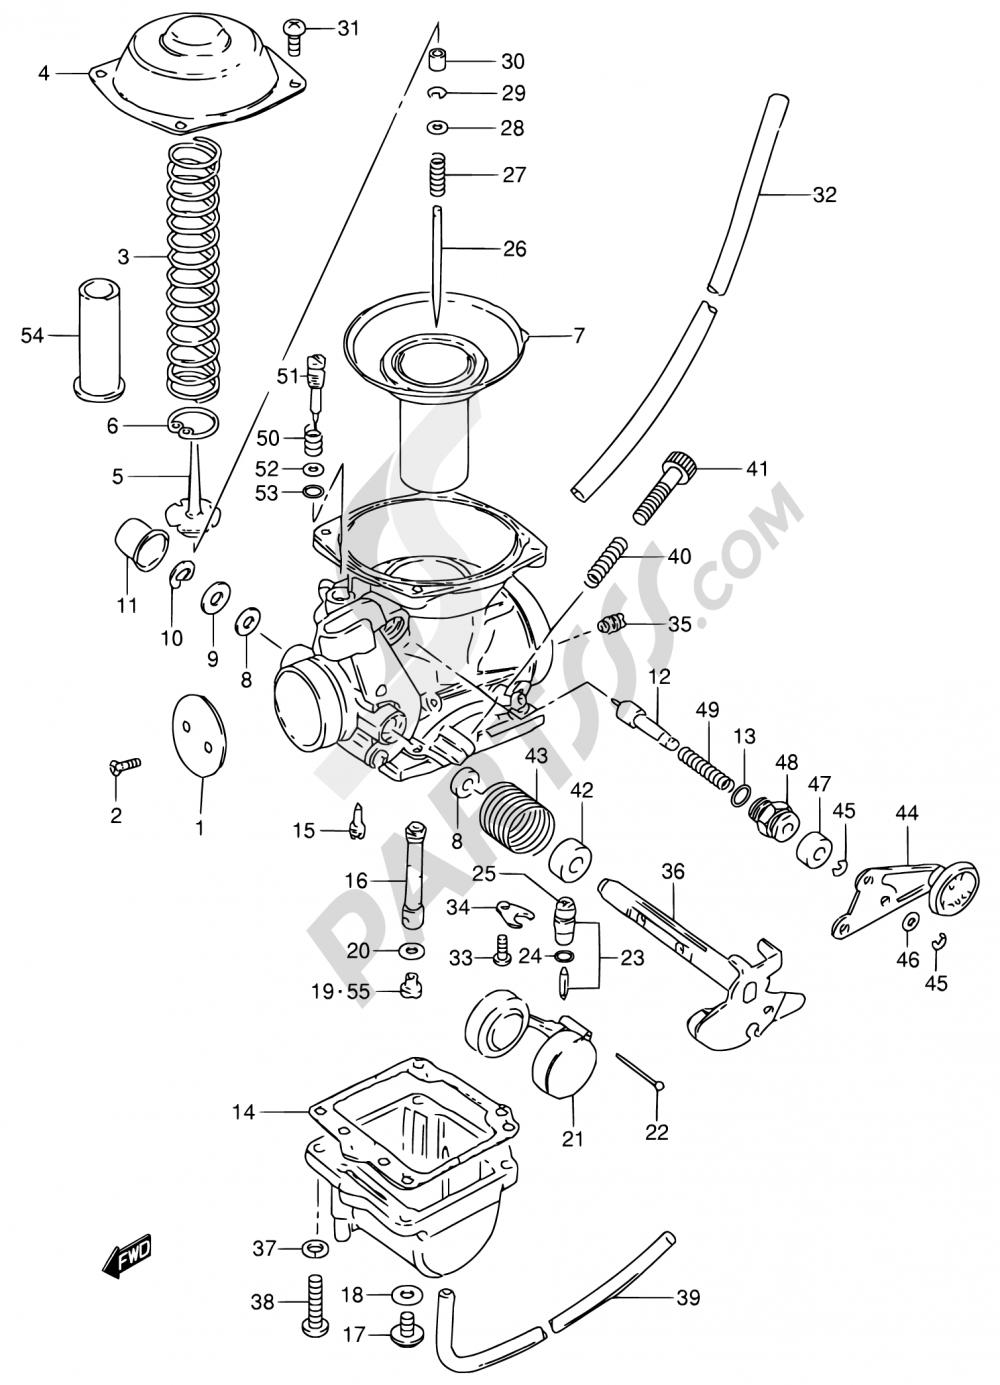 10 - CARBURETOR Suzuki GN250 1992